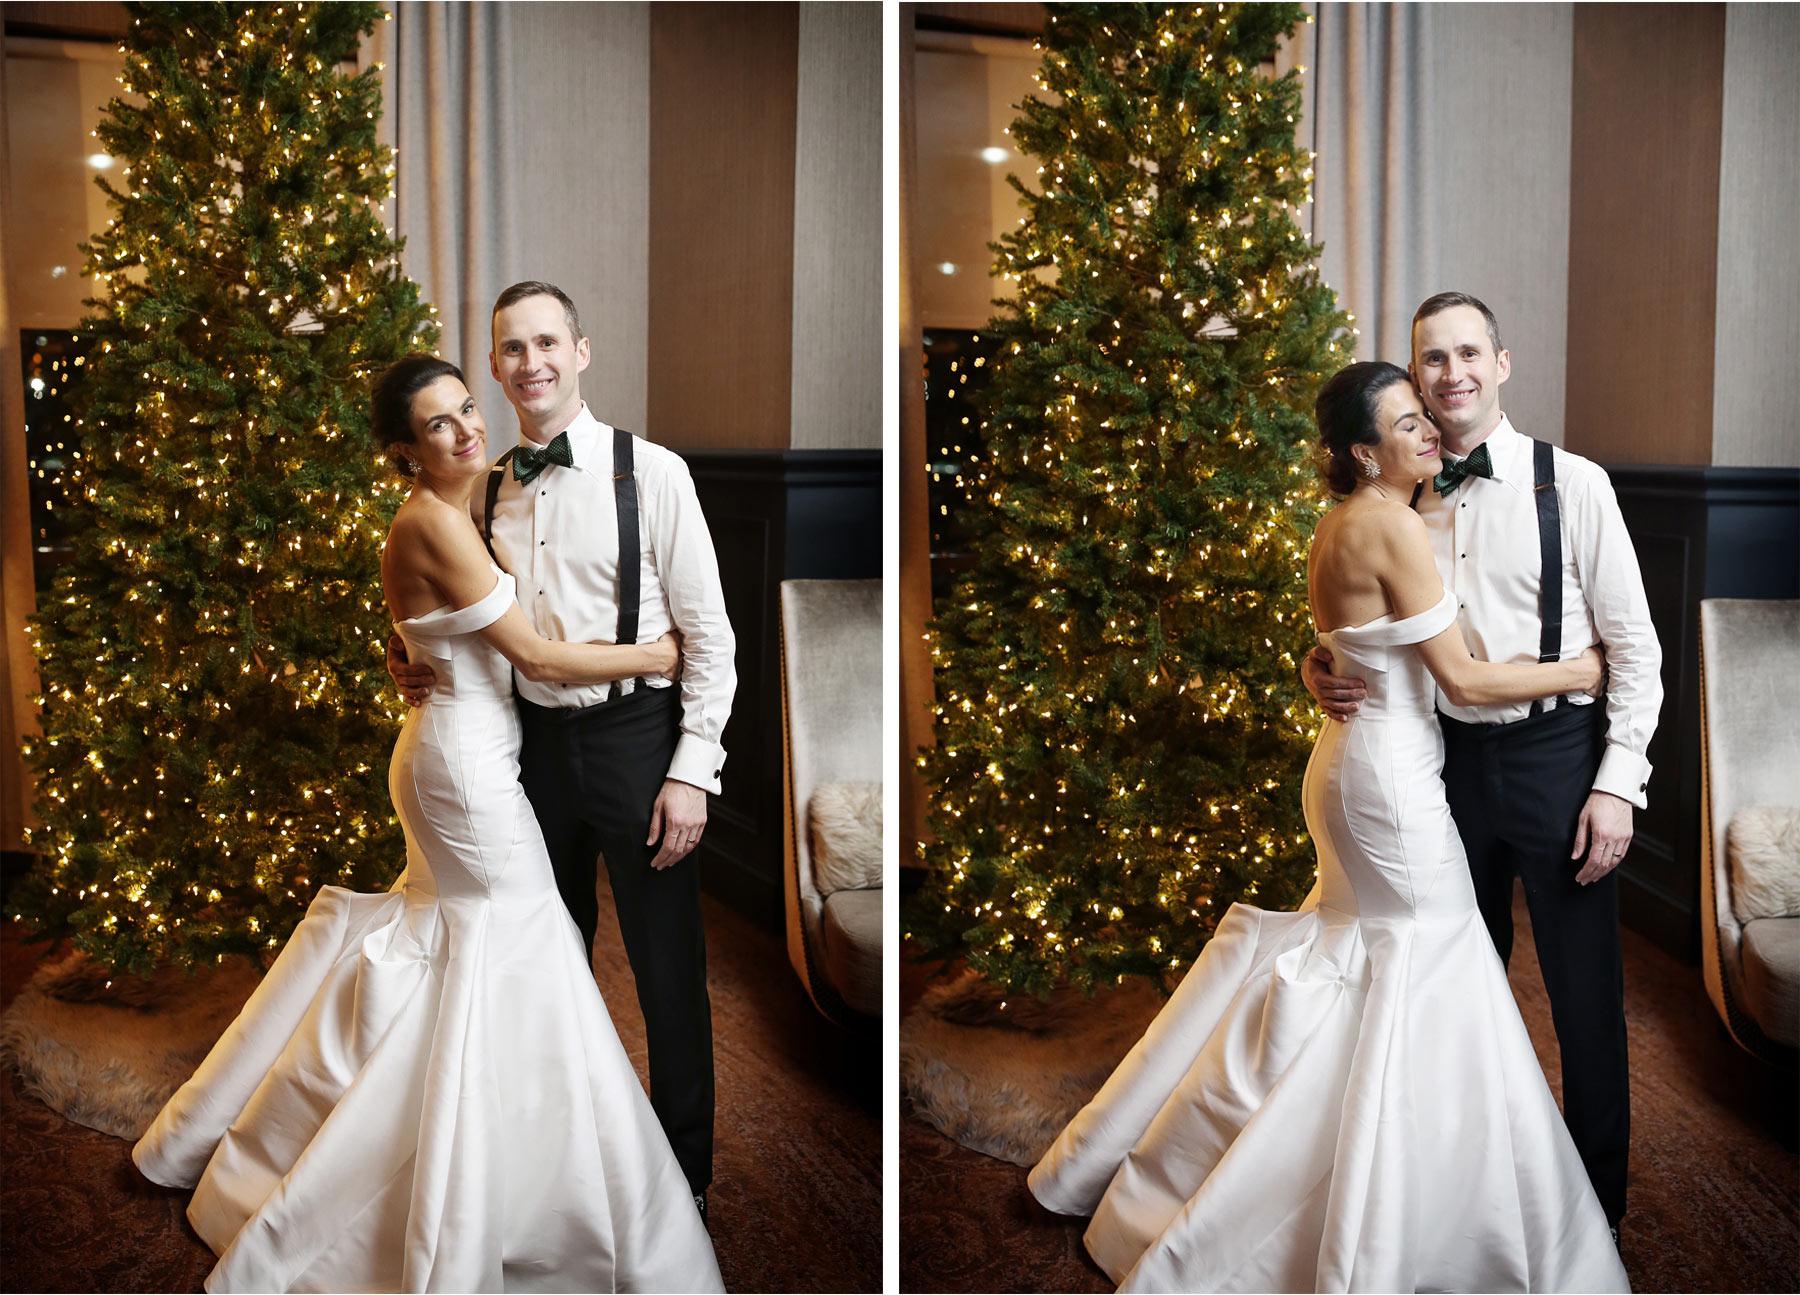 17-Minneapolis-Minnesota-Wedding-Photographer-Andrew-Vick-Photography-The-Depot-Winter-Christmas-Tree-Holiday-Bride-and-Groom-Allison-and-Steve.jpg